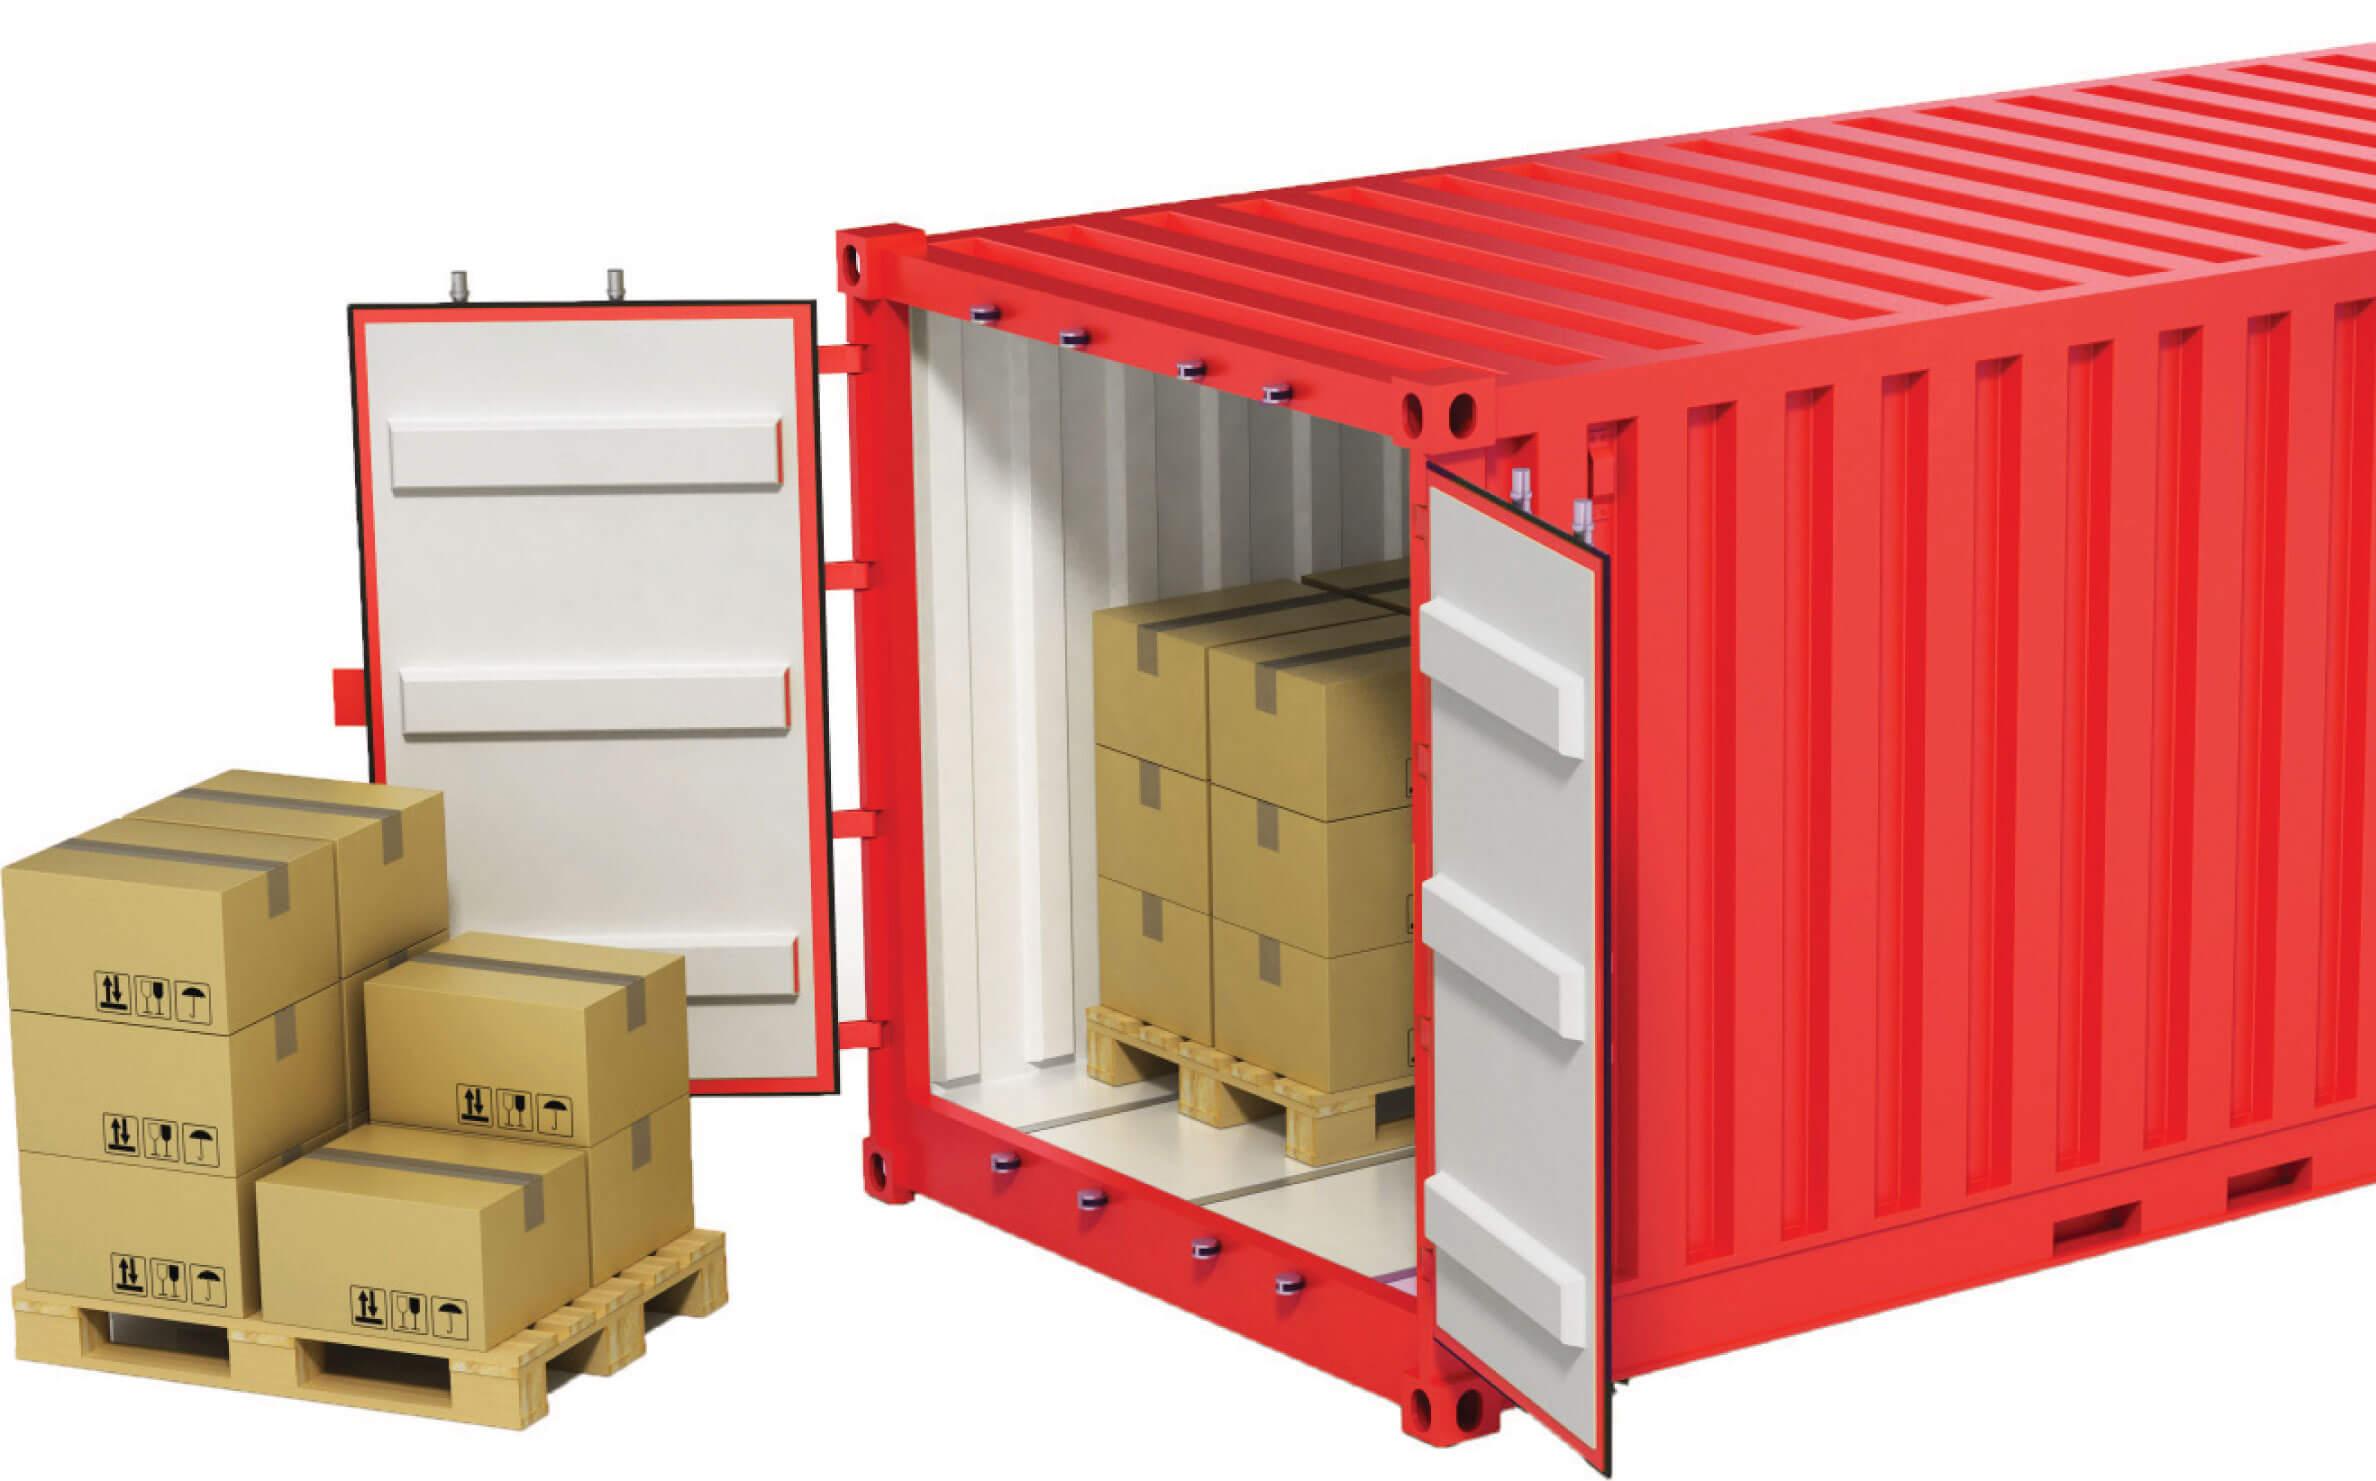 skladisni kontejneri